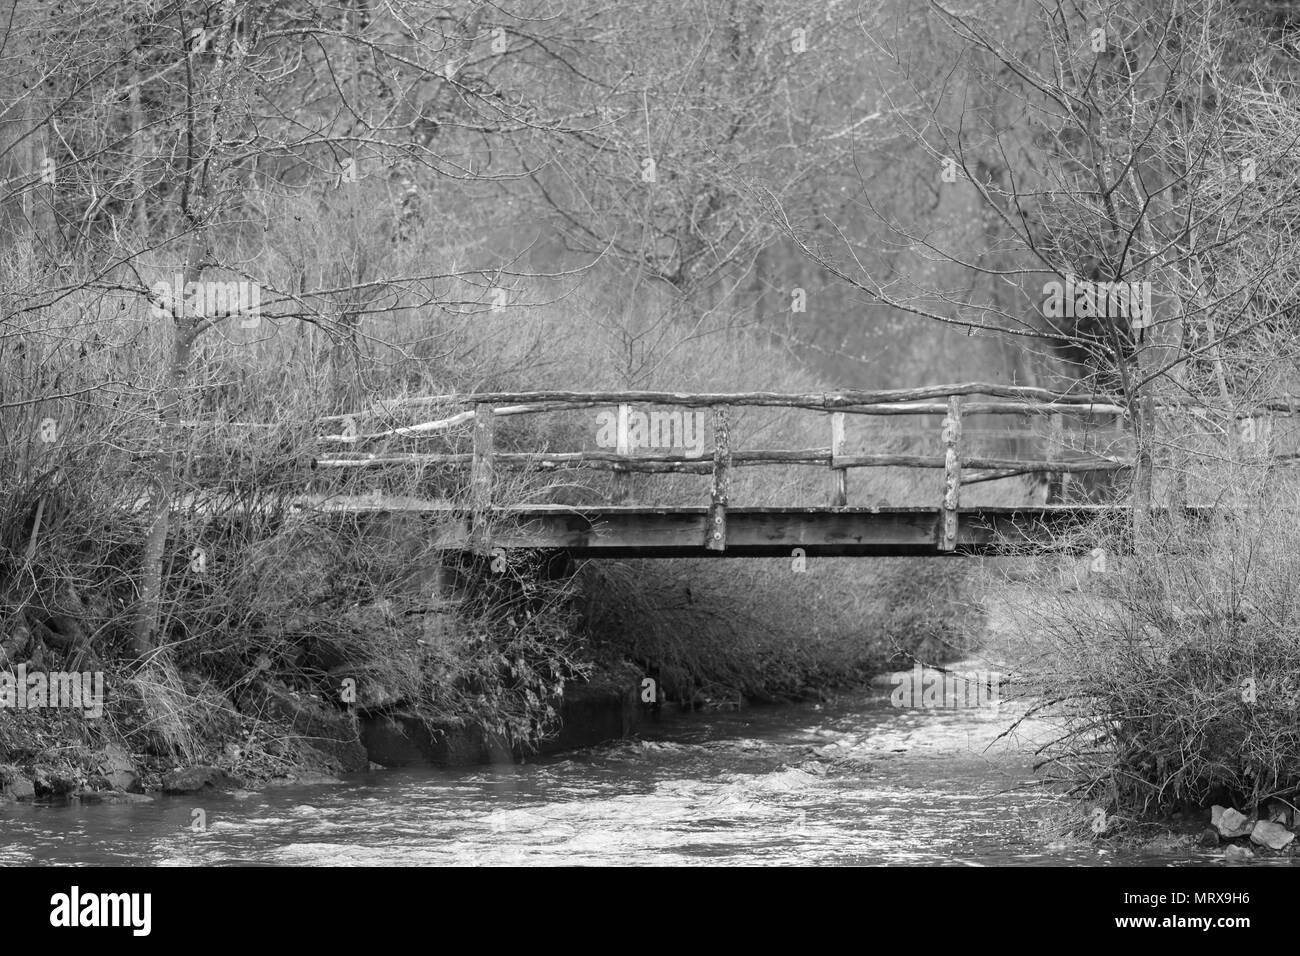 Bridge over a stream - Stock Image